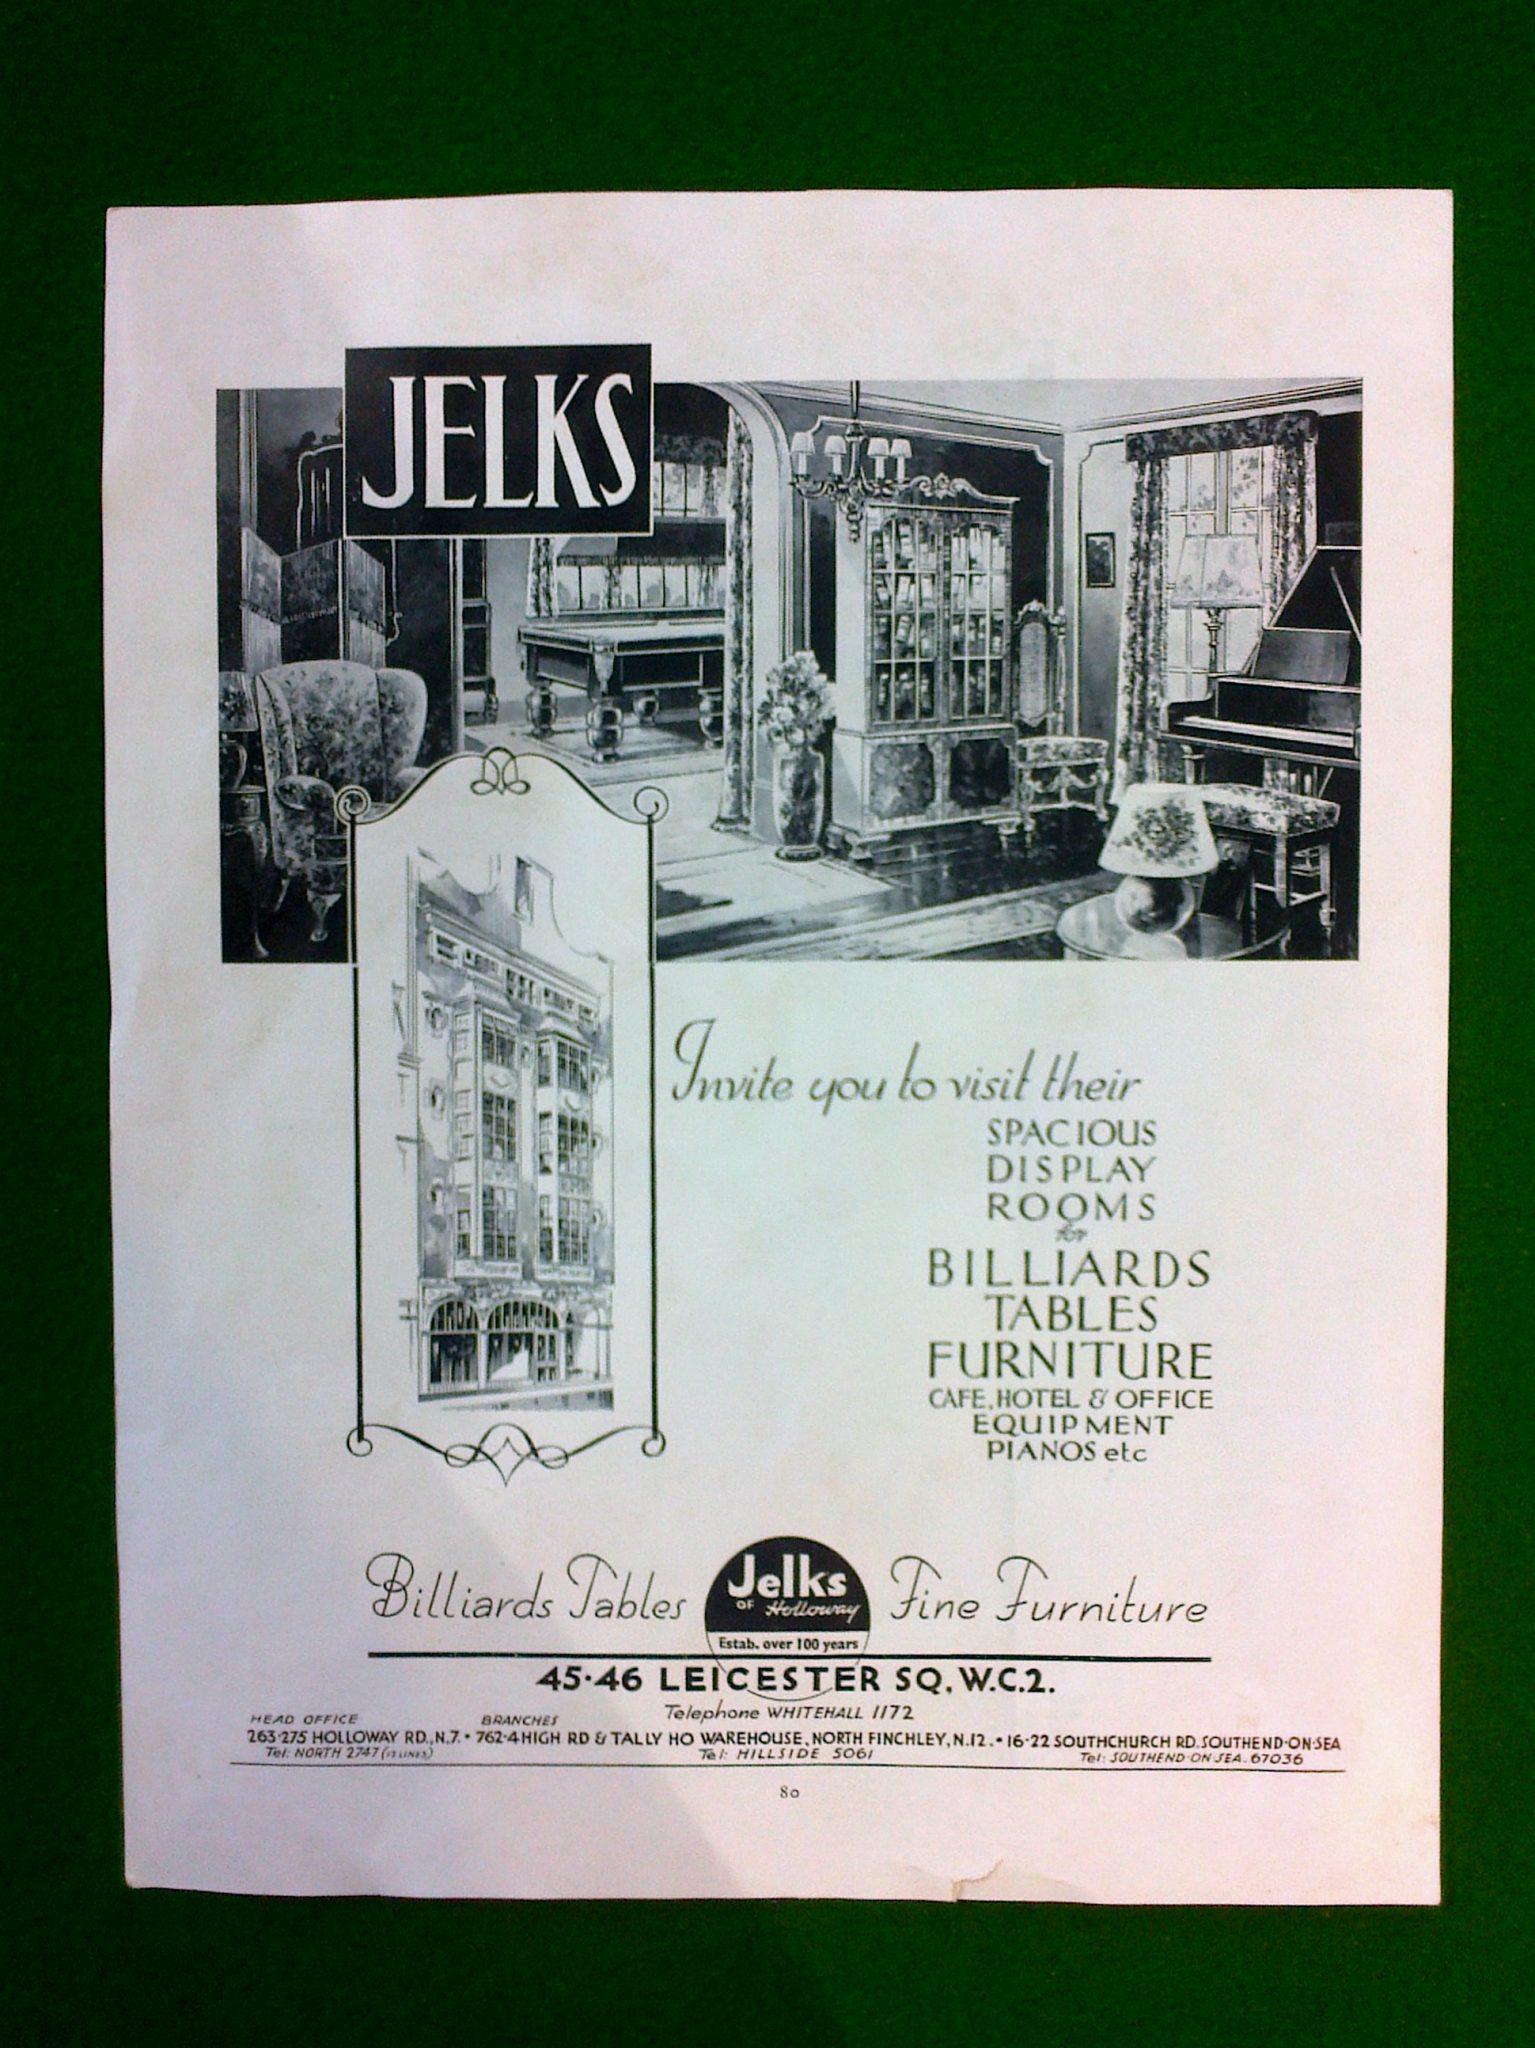 Jelks Antique Billiards Tables Advert Billiards Tables